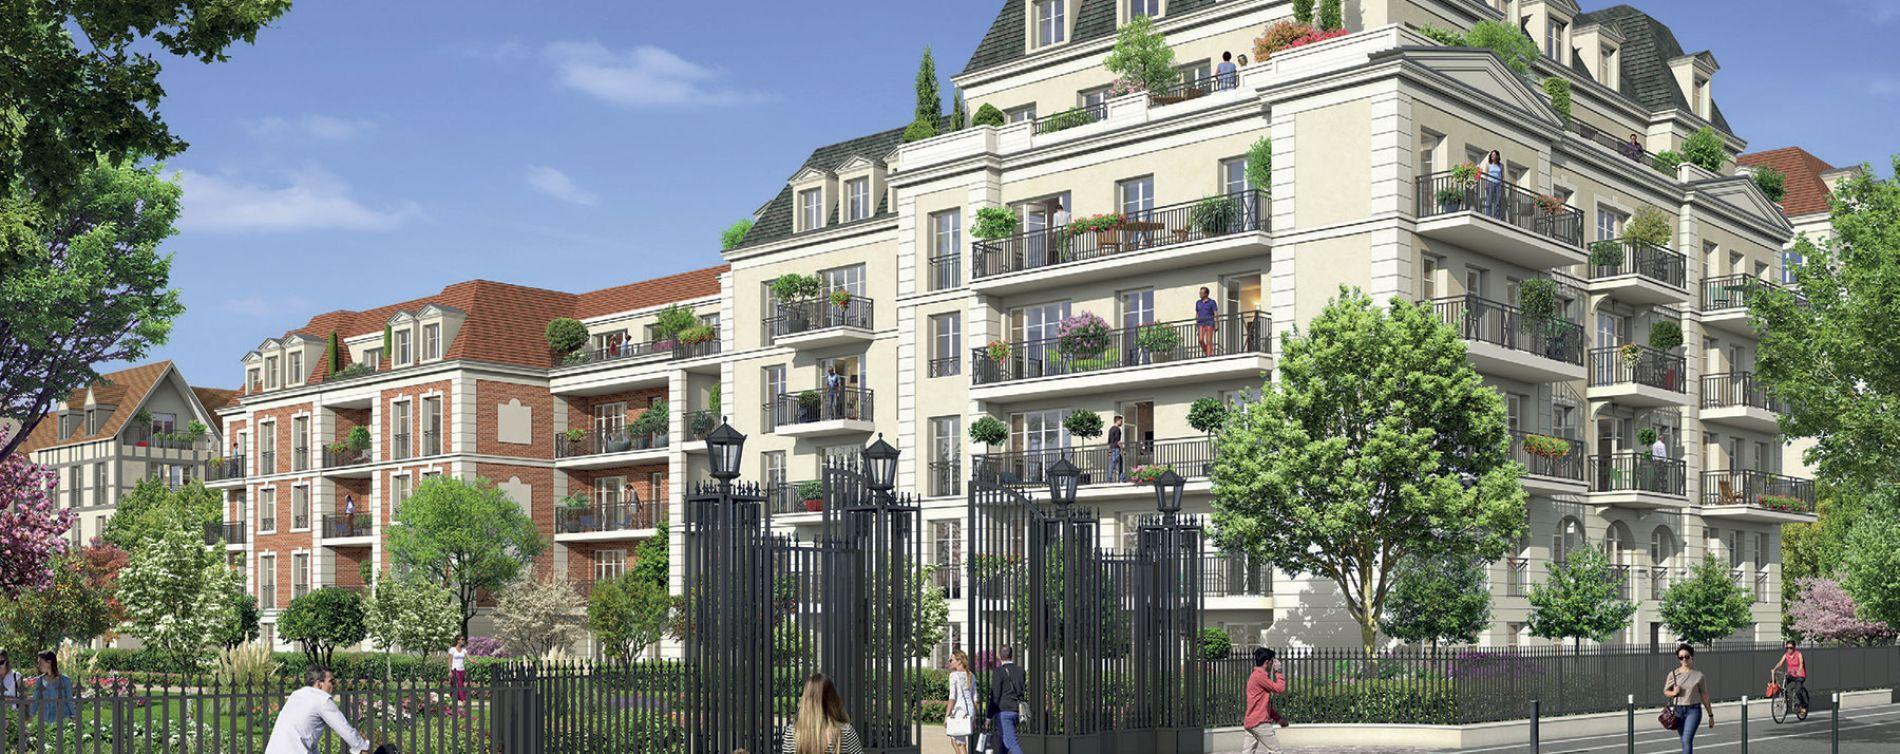 Résidence Jardins des Orfèvres au Blanc-Mesnil